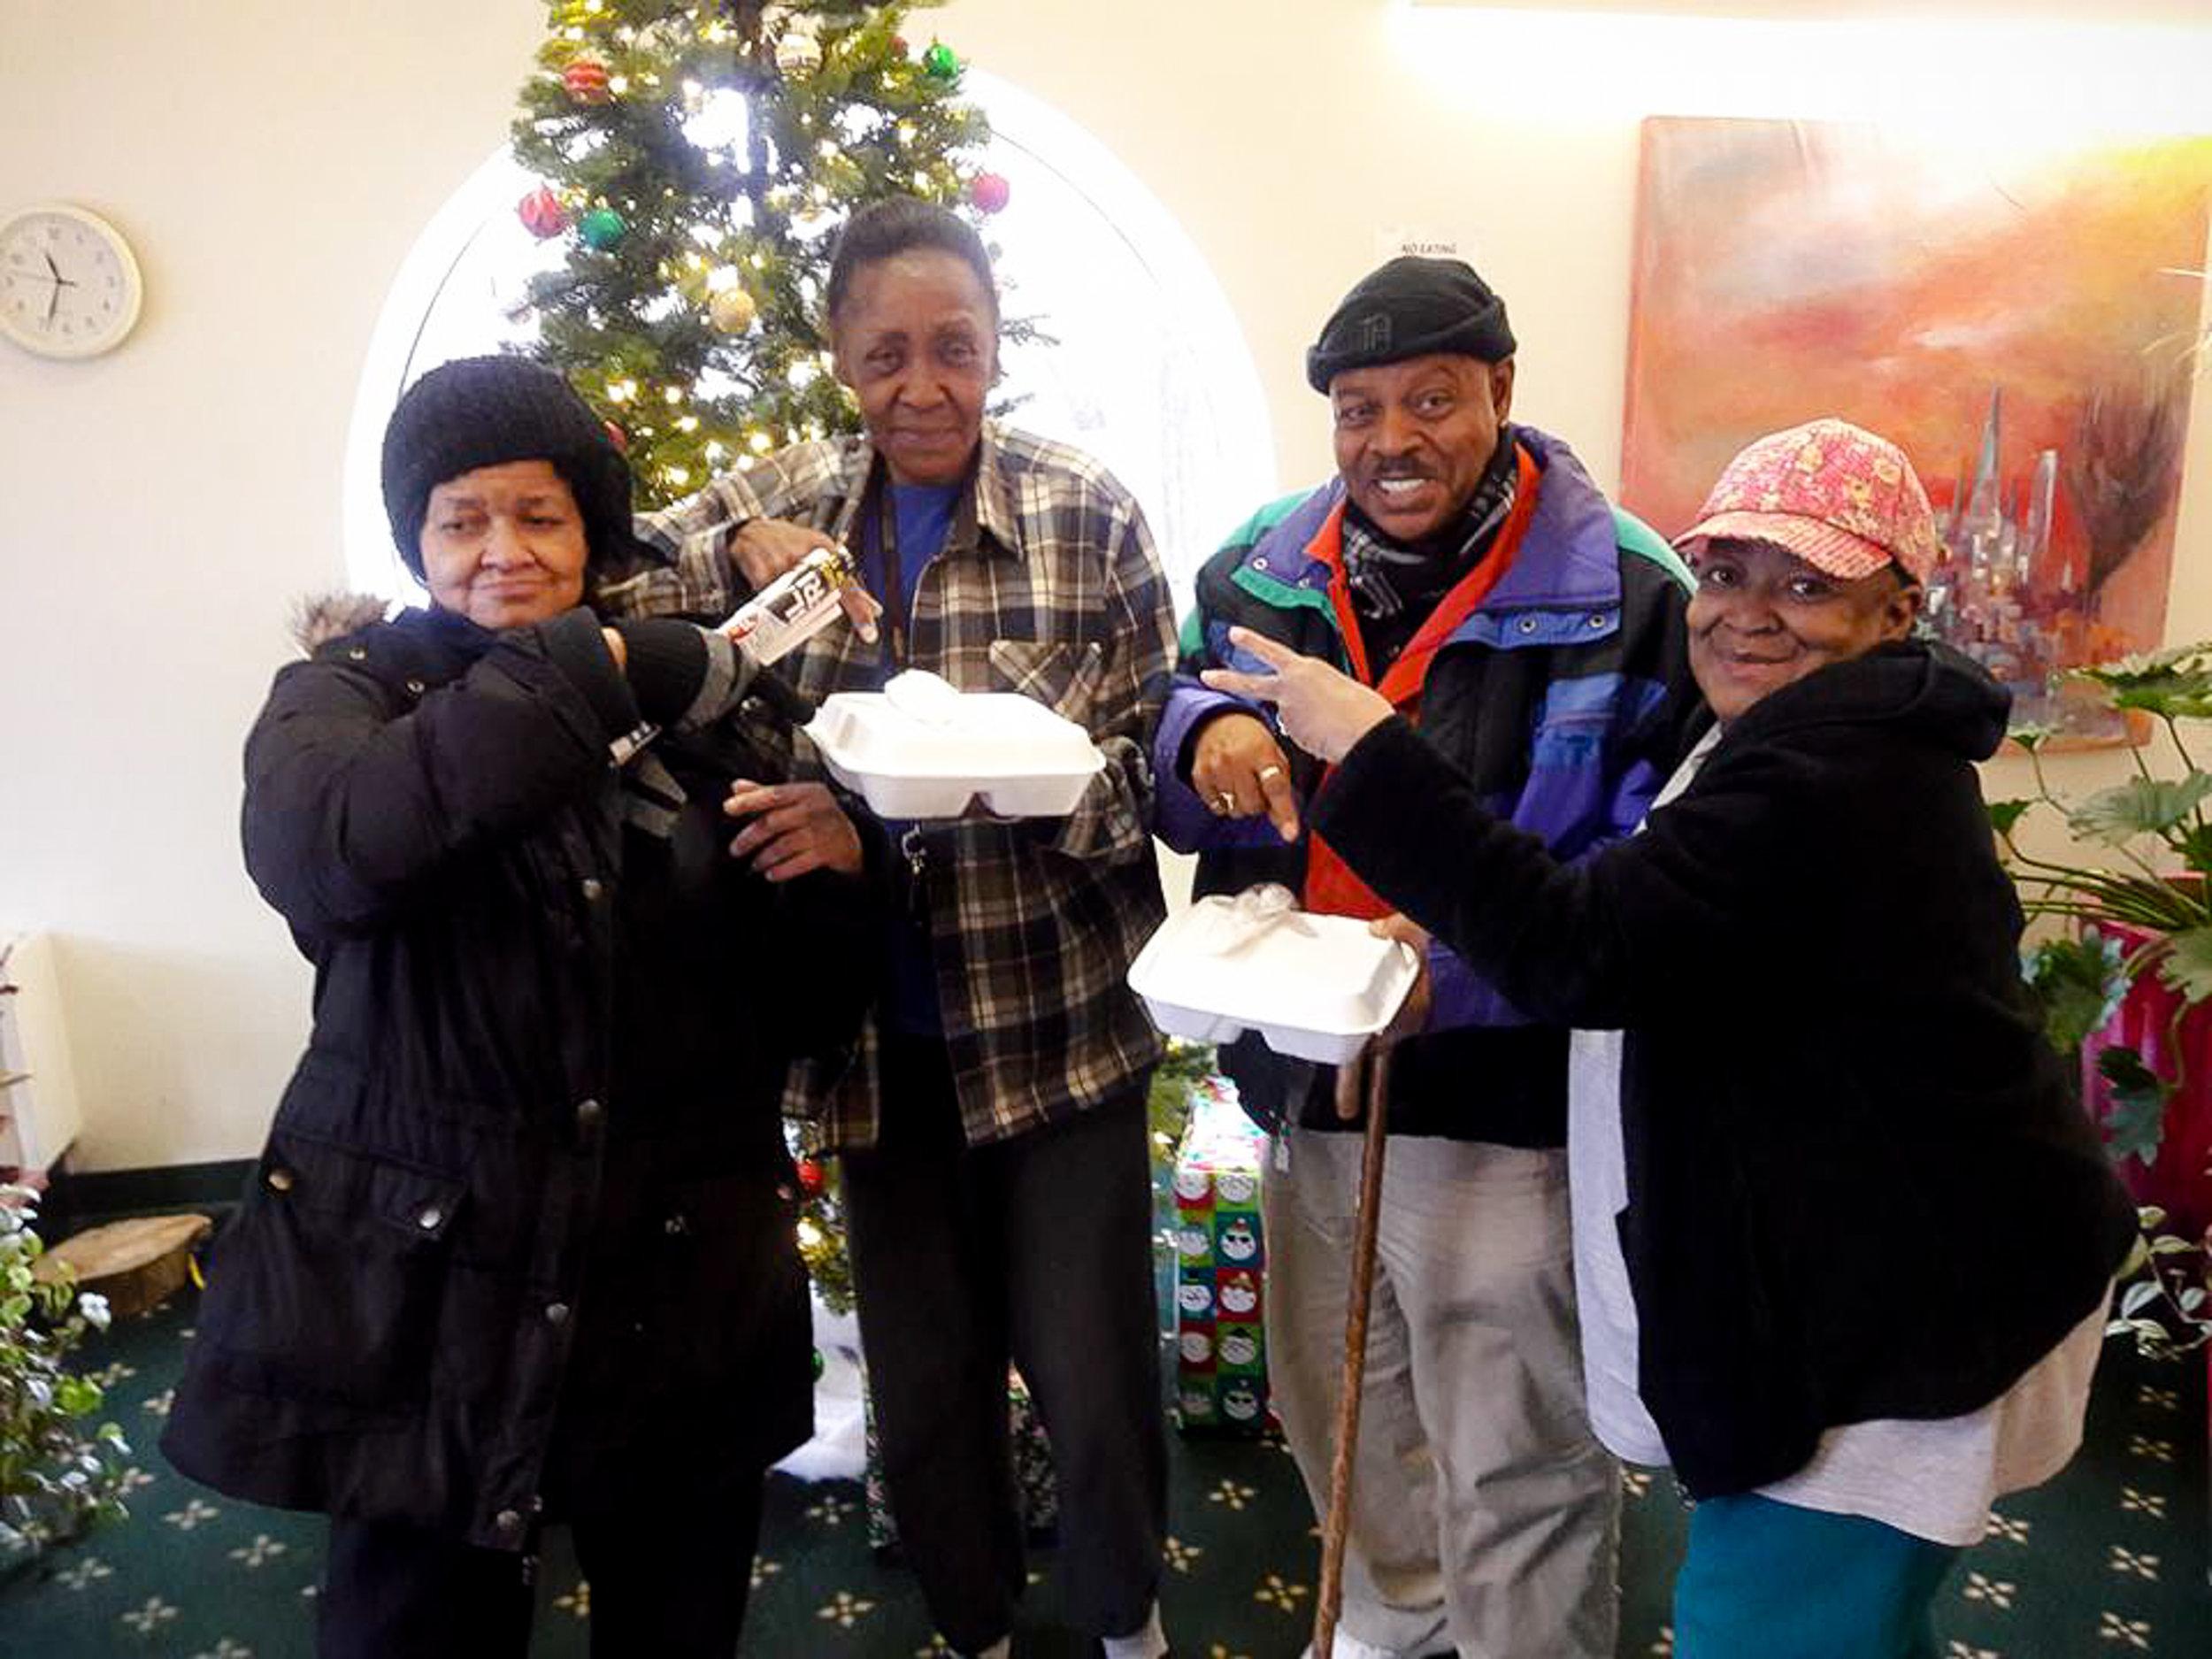 Thanksgiving-Detroit-Downriver-APRI-Michigan-lifestyle-ChettaraTPhotography-.jpg